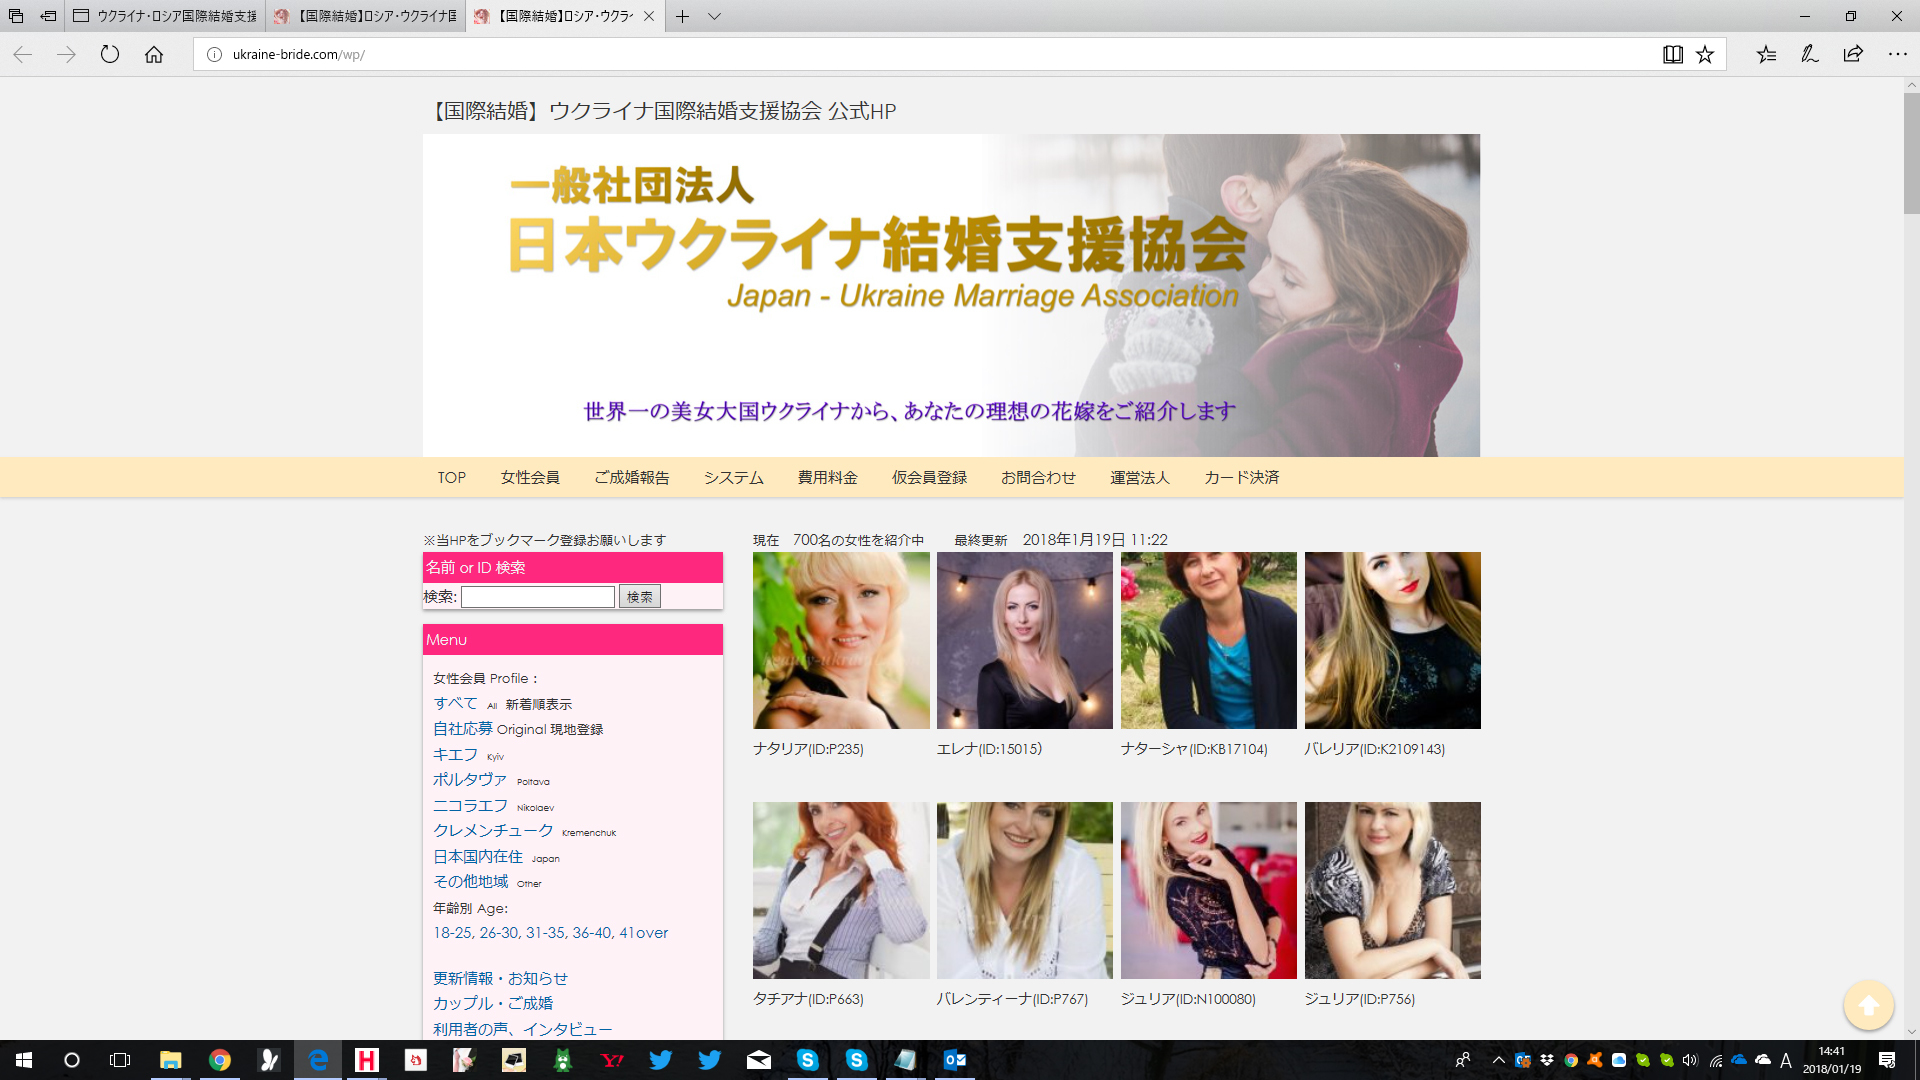 kyoukai_top_page_1.jpg